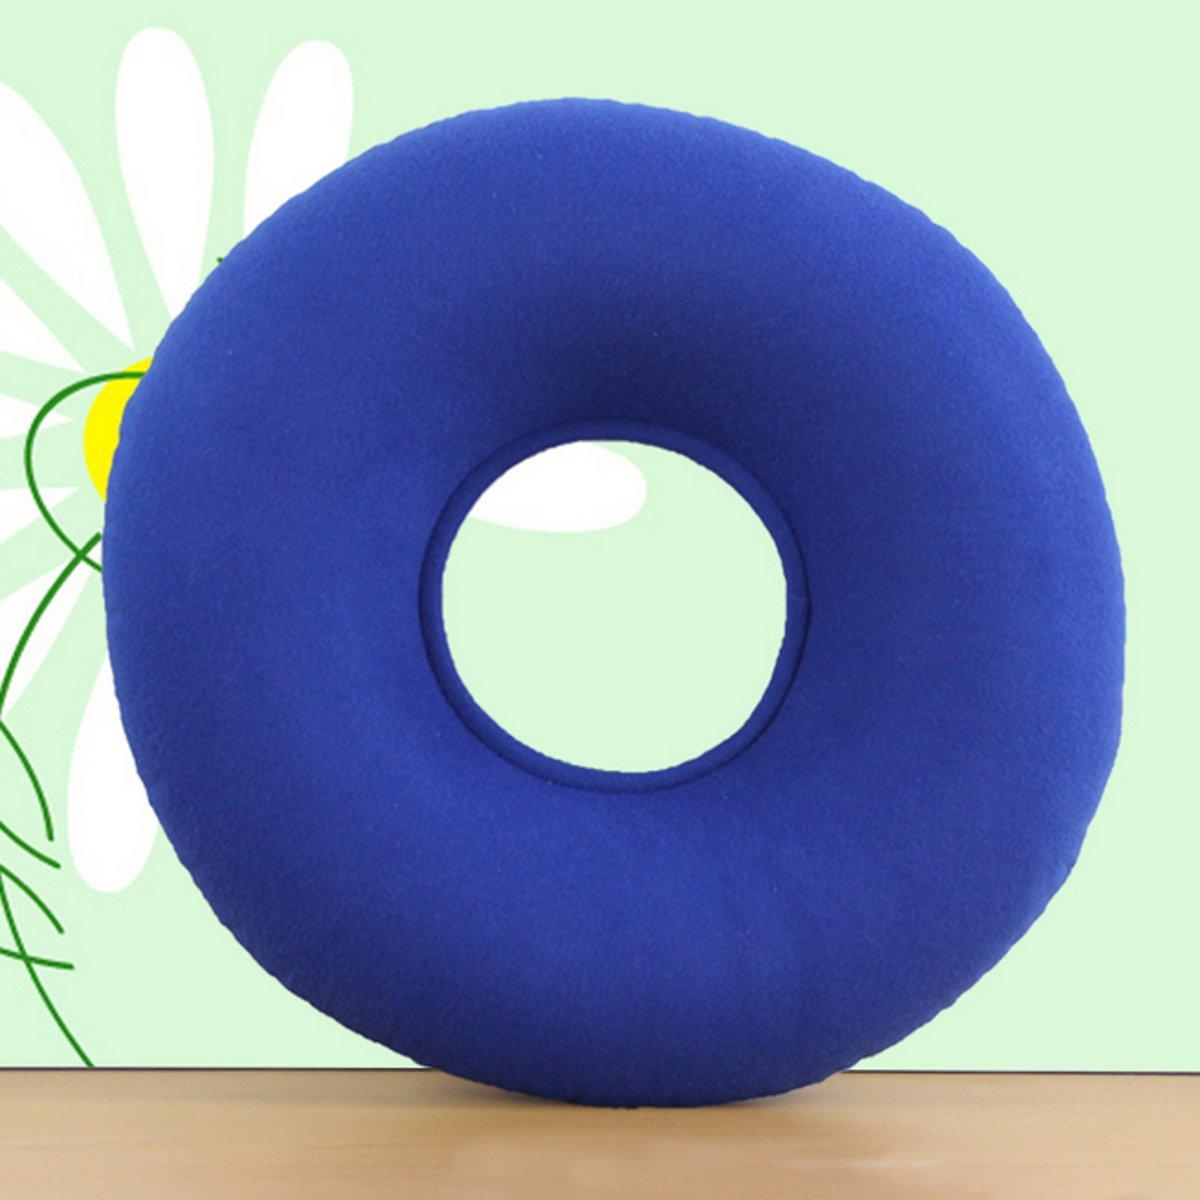 Medical Inflatable Seat Cushion Ring Round PVC Seat Air Massage Mattress Pillow Anti Hemorrhoid Home Office Chair Supplies